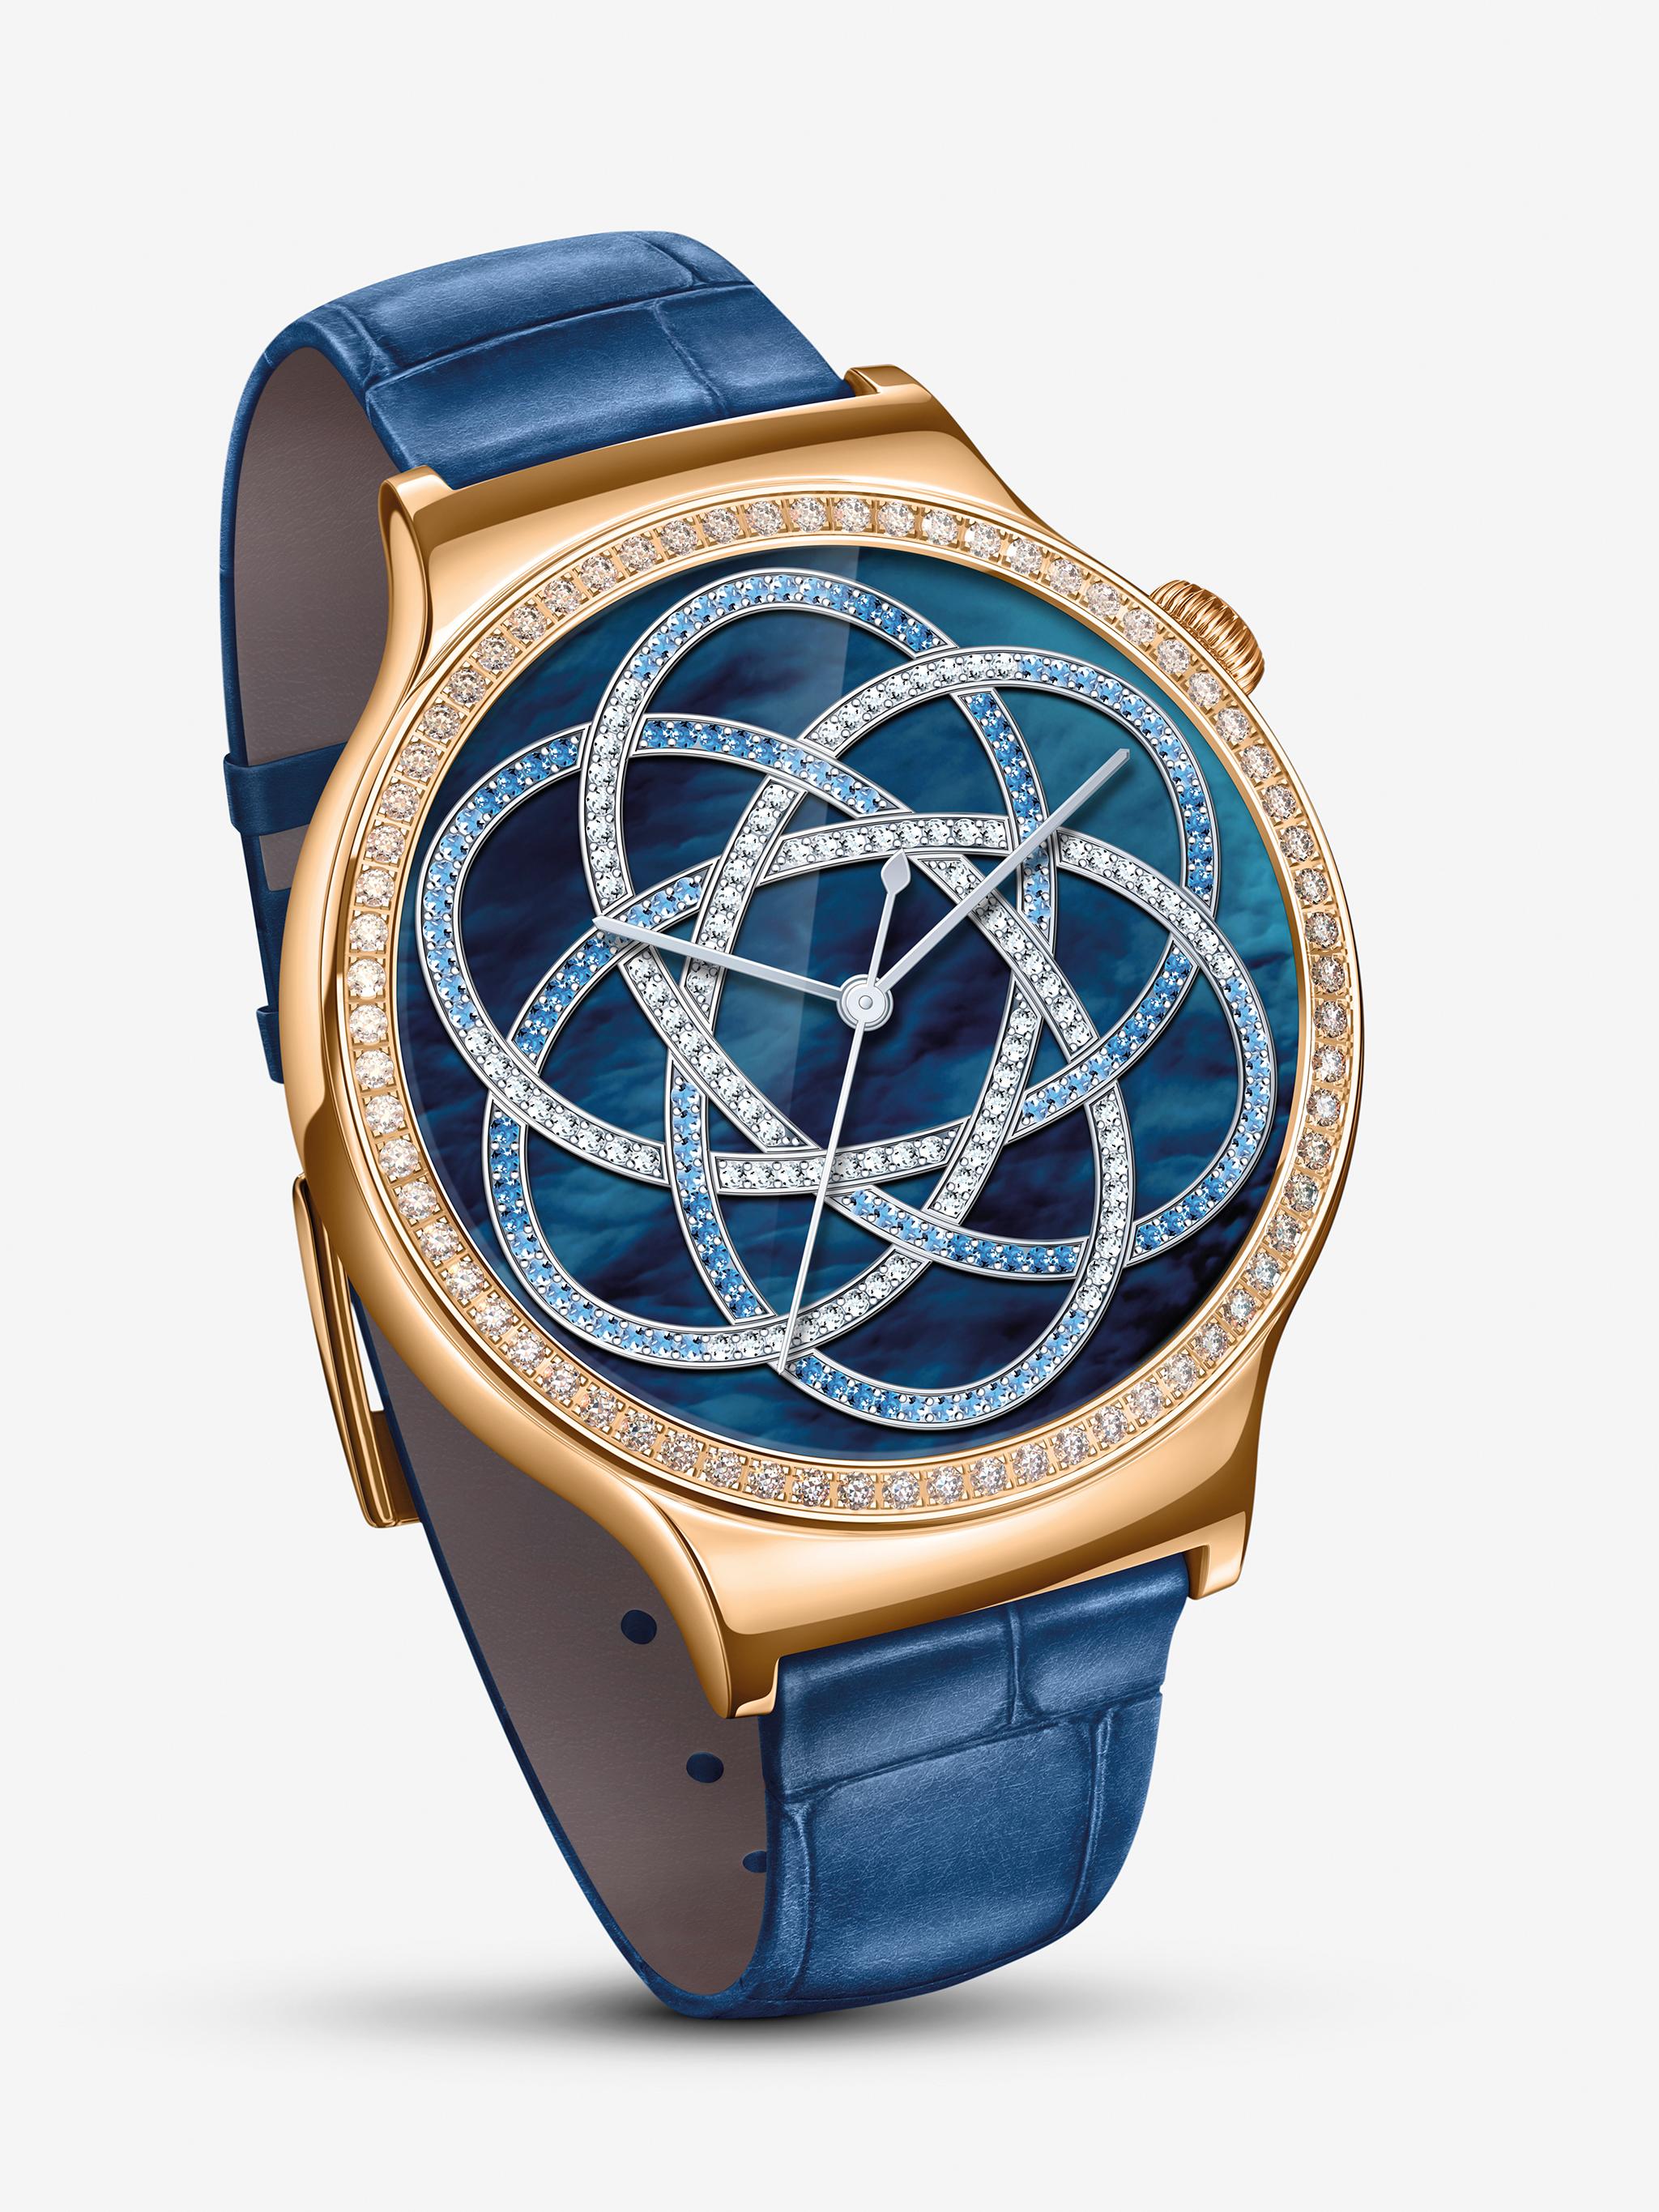 The-Huawei-Watch-Jewel-01